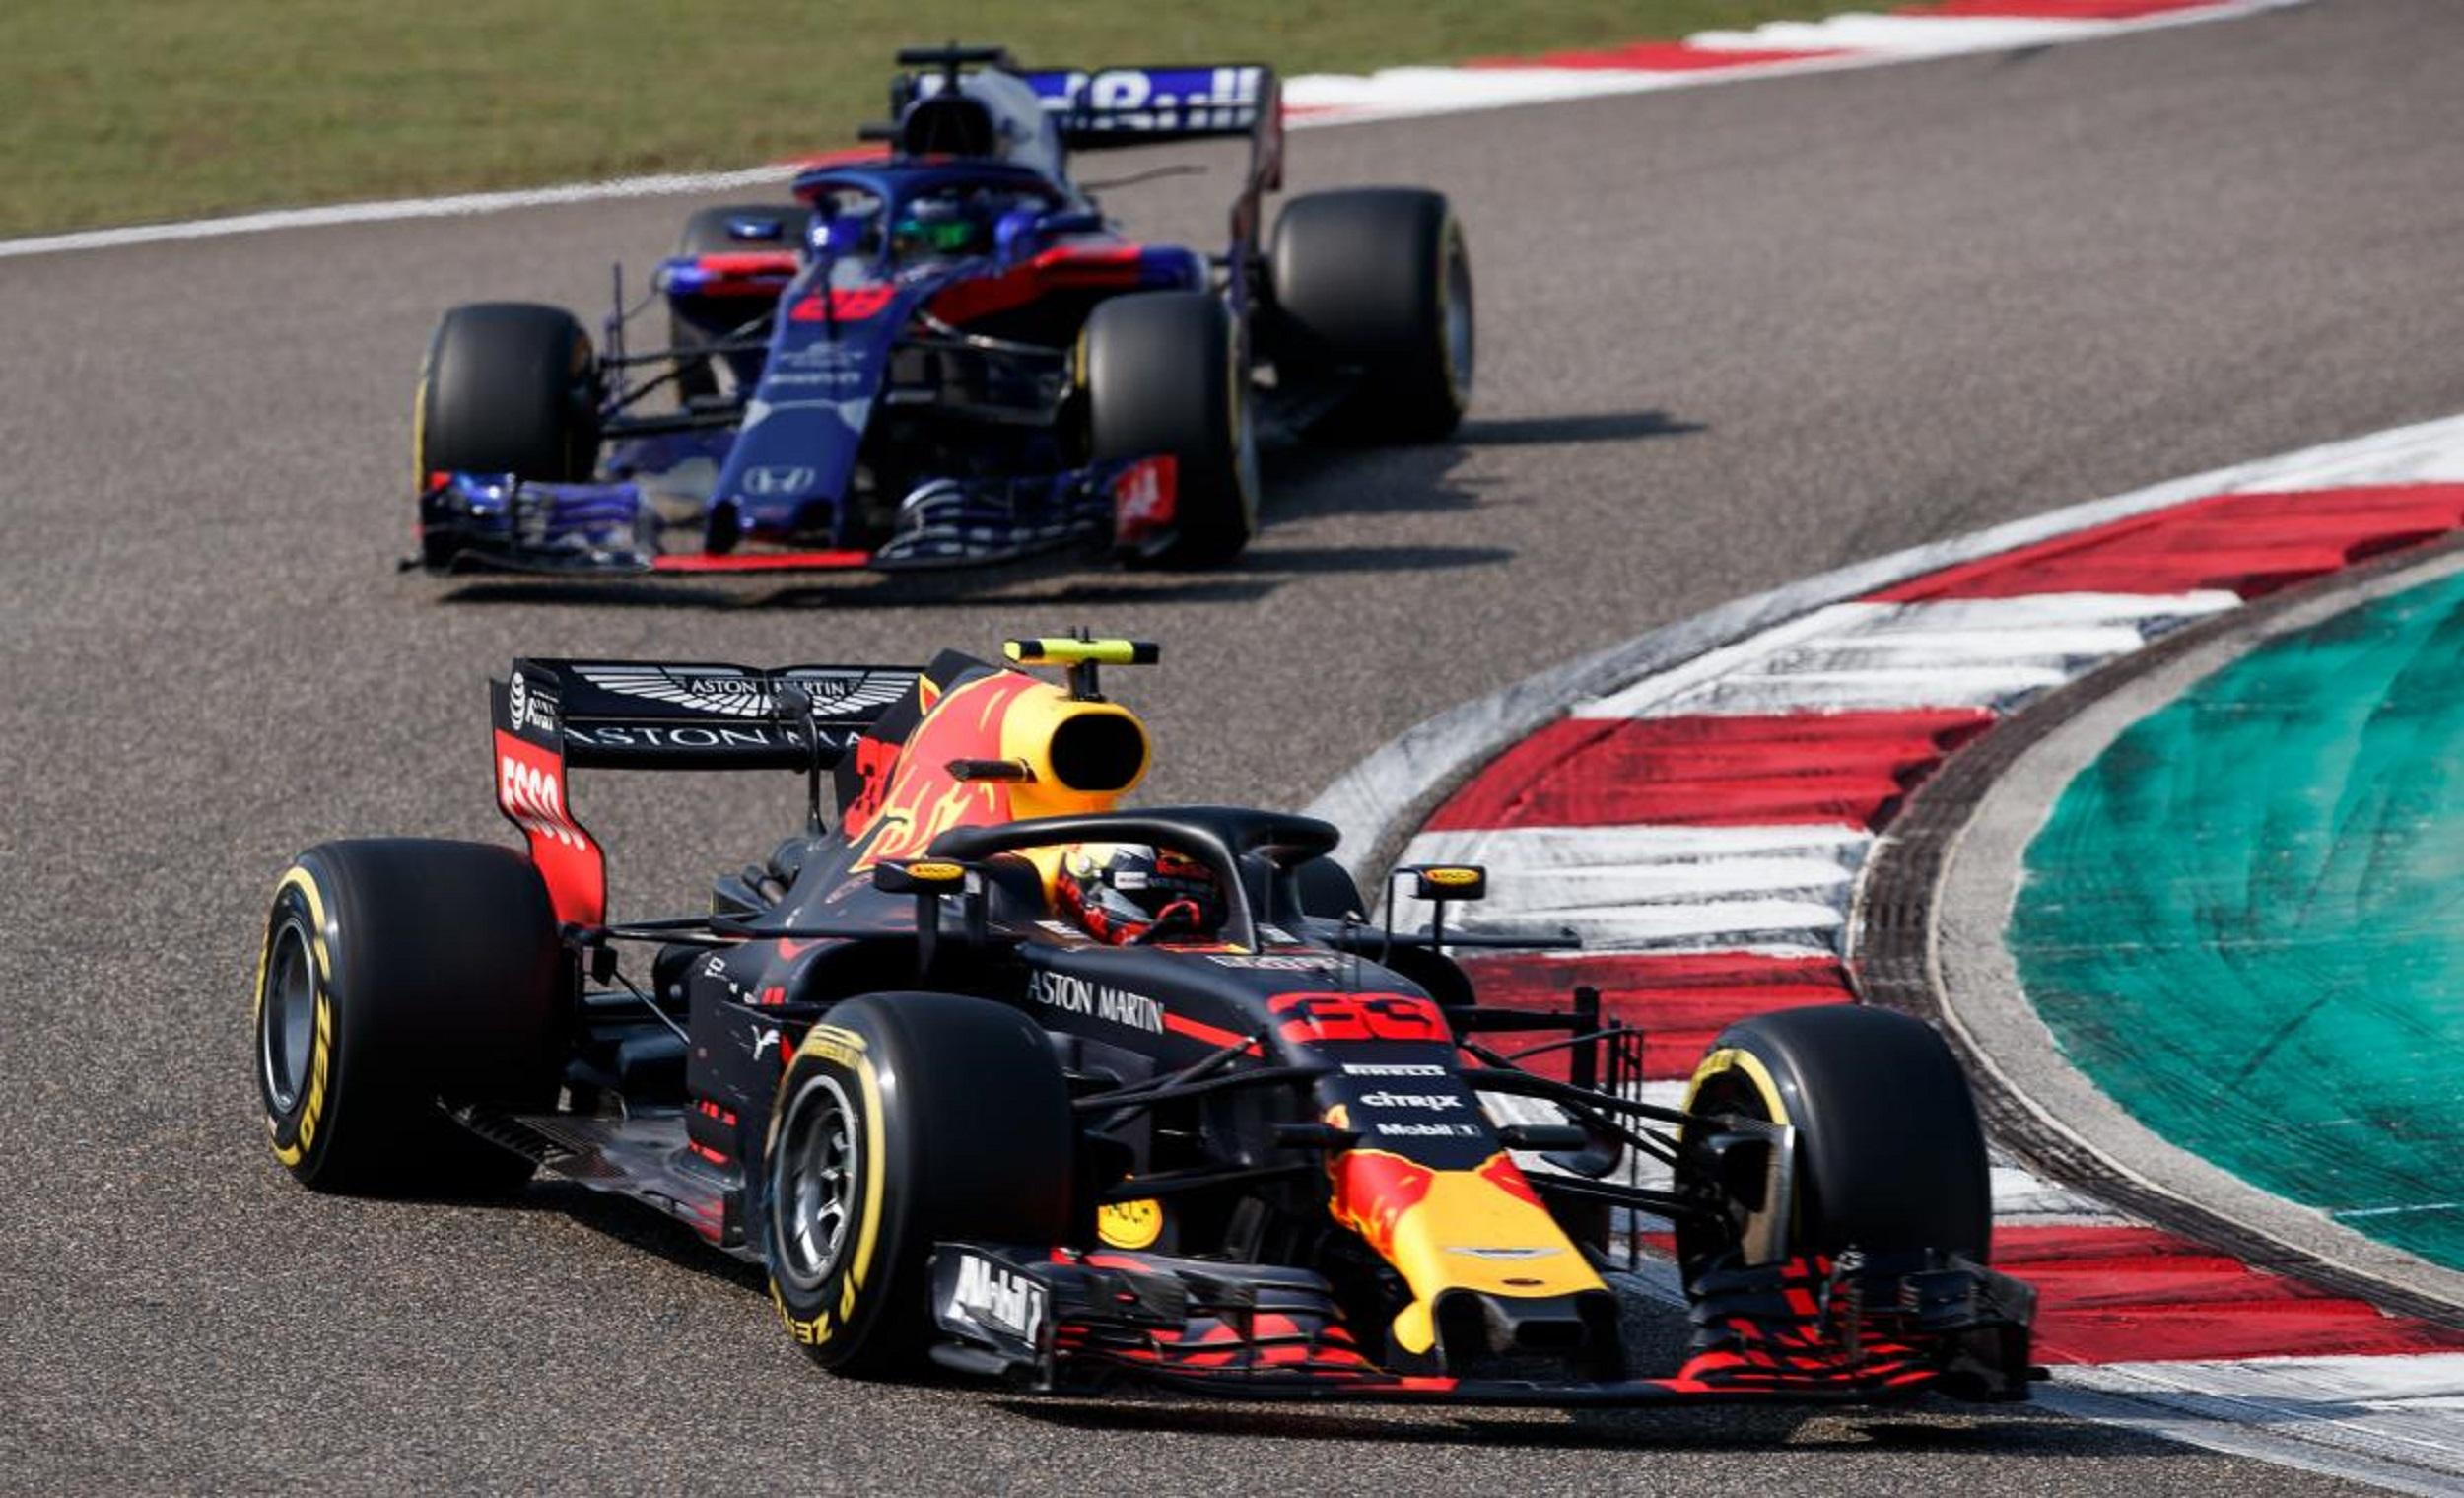 F1 Biaya Menjadi Faktor Terbesar yang Menentukan Masa Depan Honda di F1   blackxperience.com